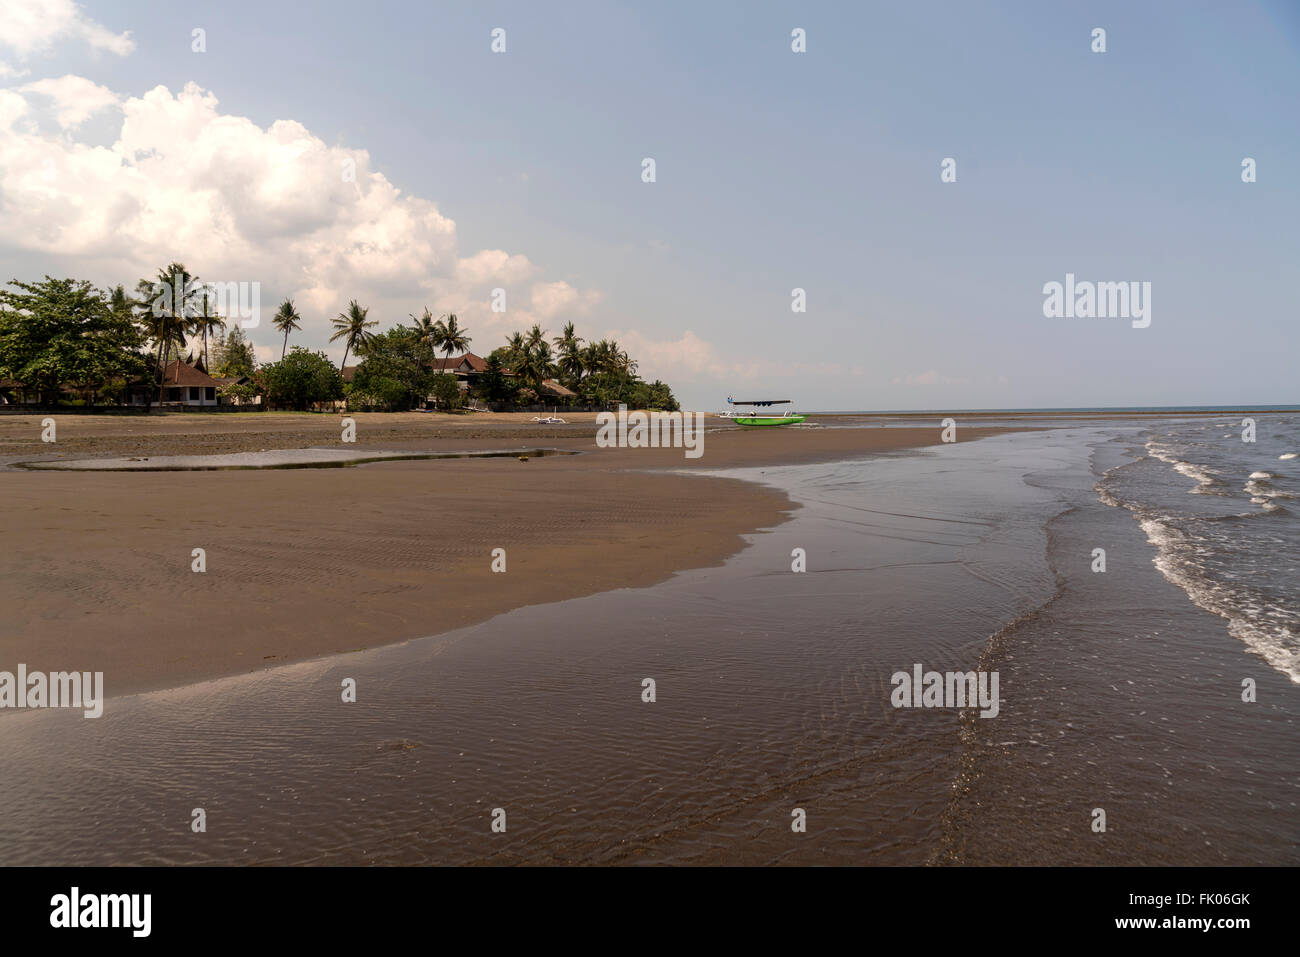 sandy Lovina Beach, Lovina, Bali, Indonesia - Stock Image